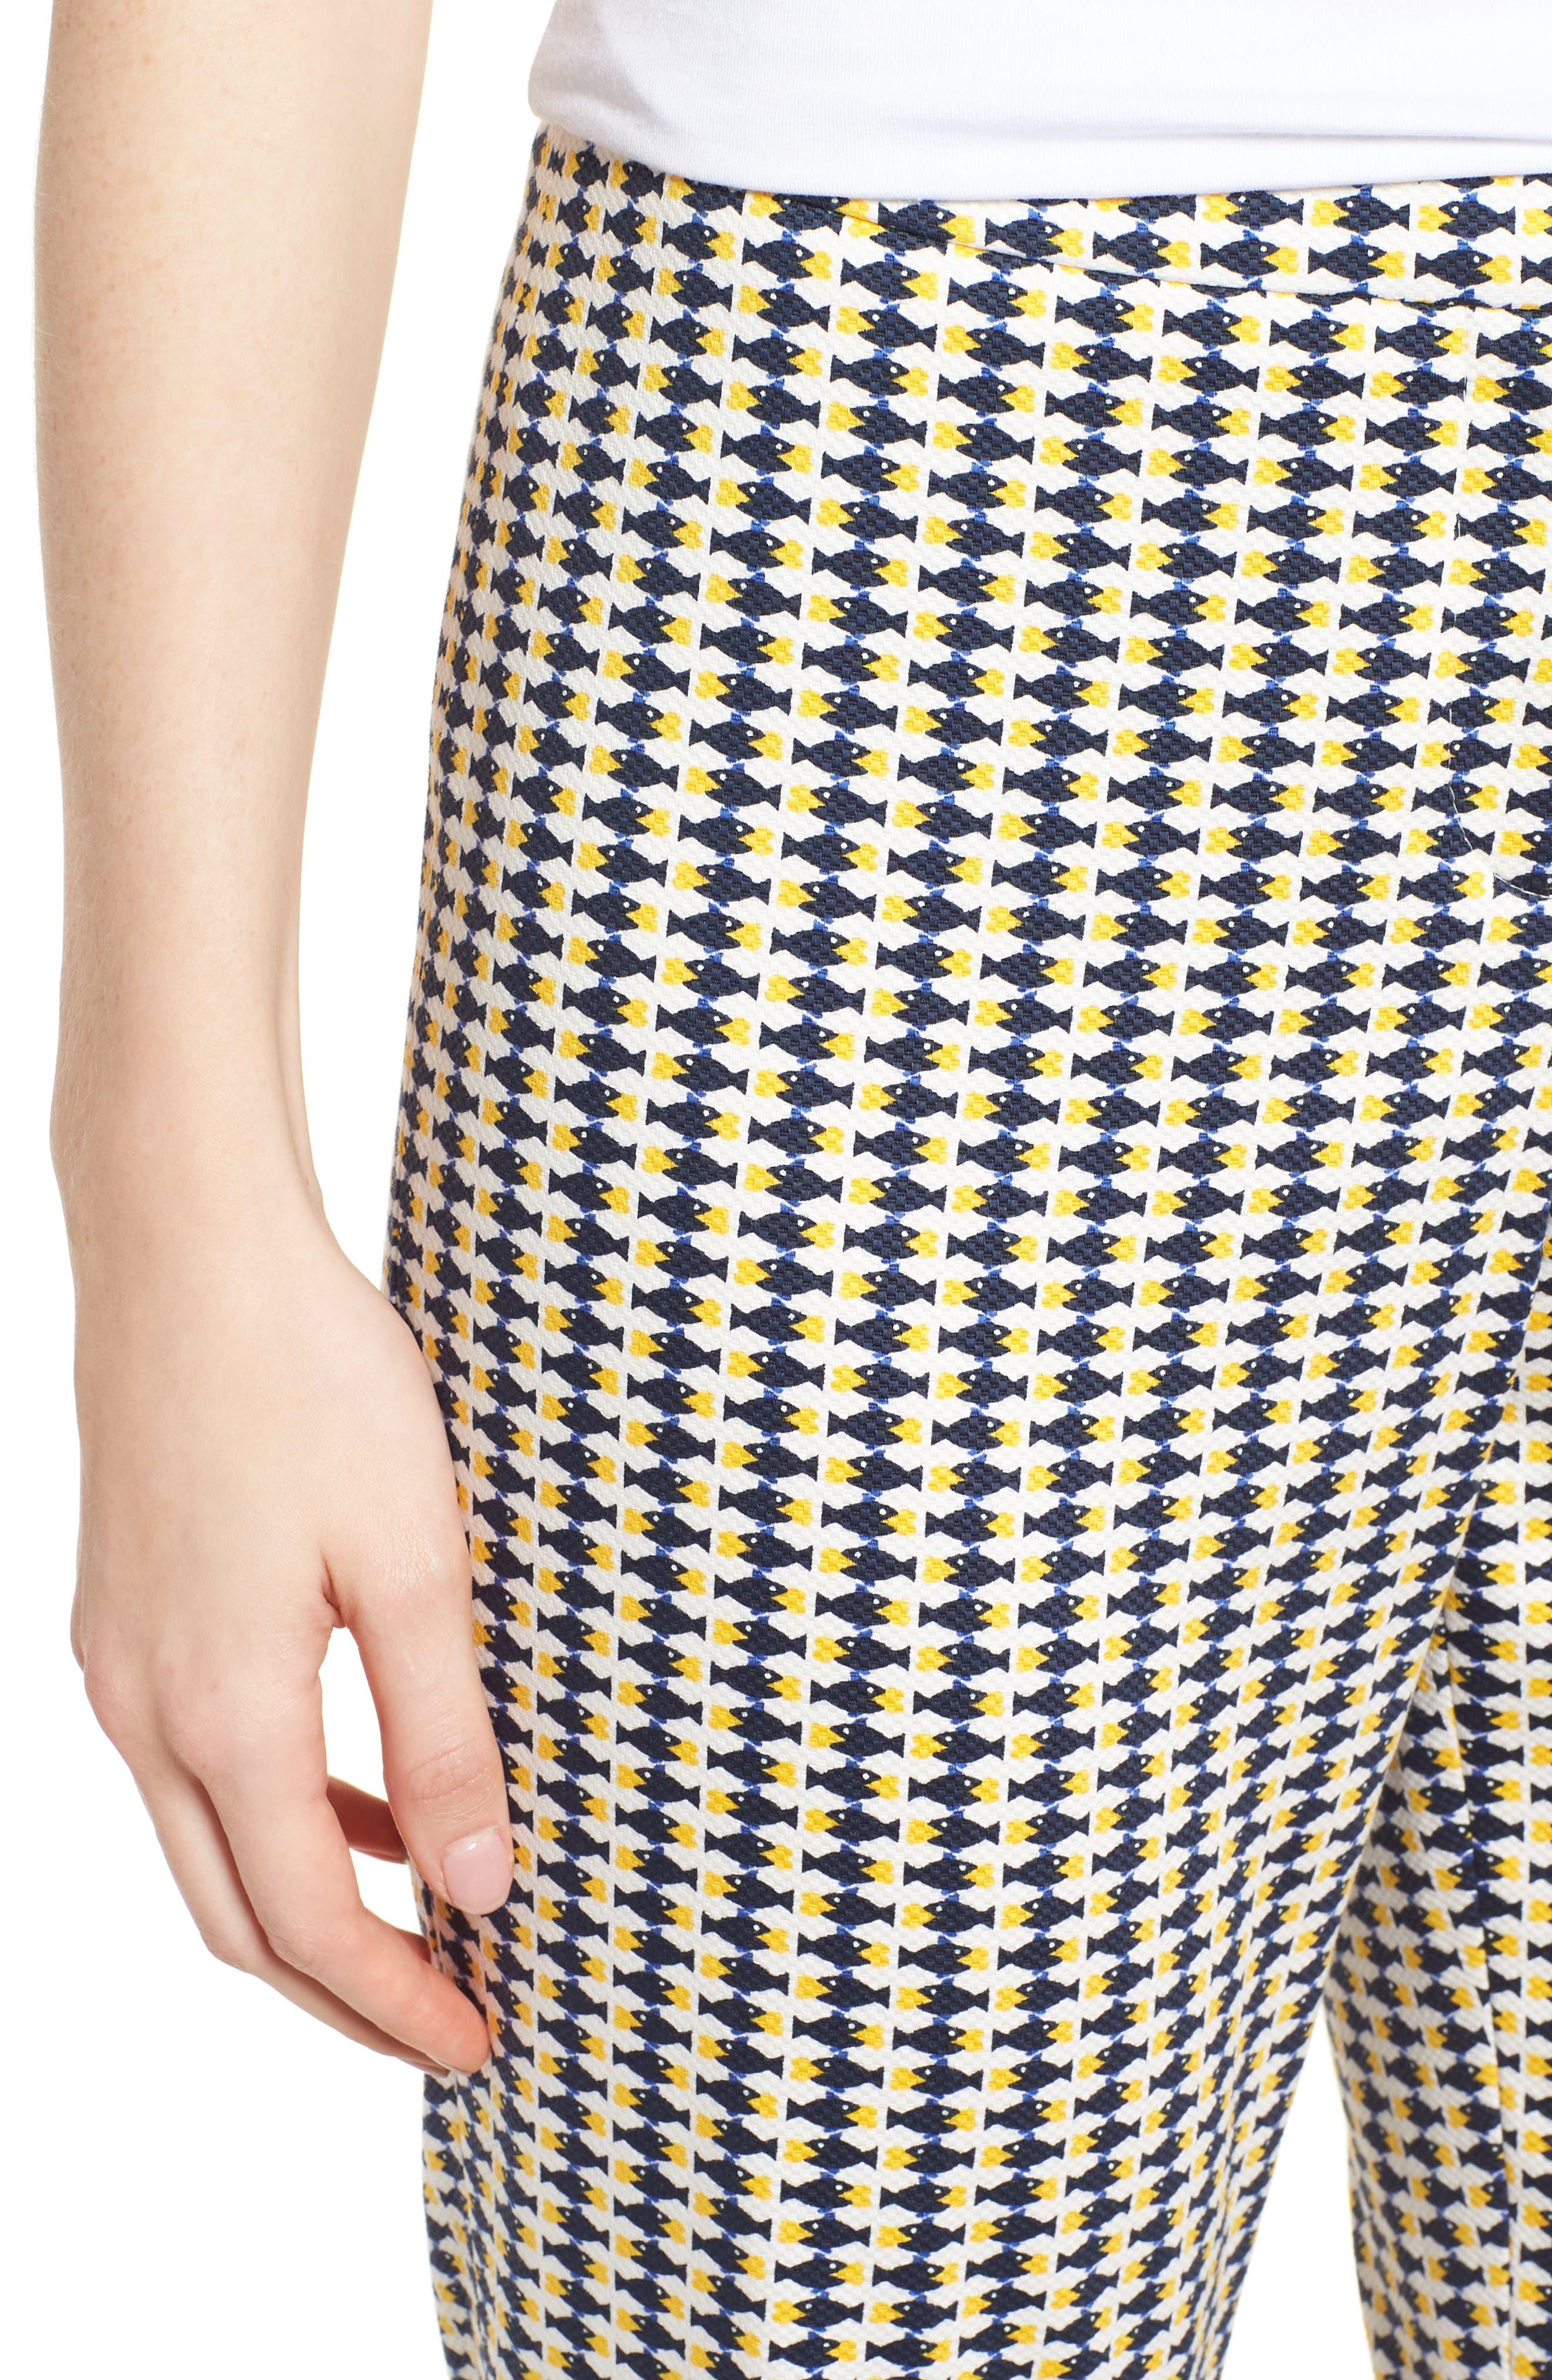 Tiluna6 Heartfish Slim Ankle Trousers,                             Alternate thumbnail 4, color,                             186